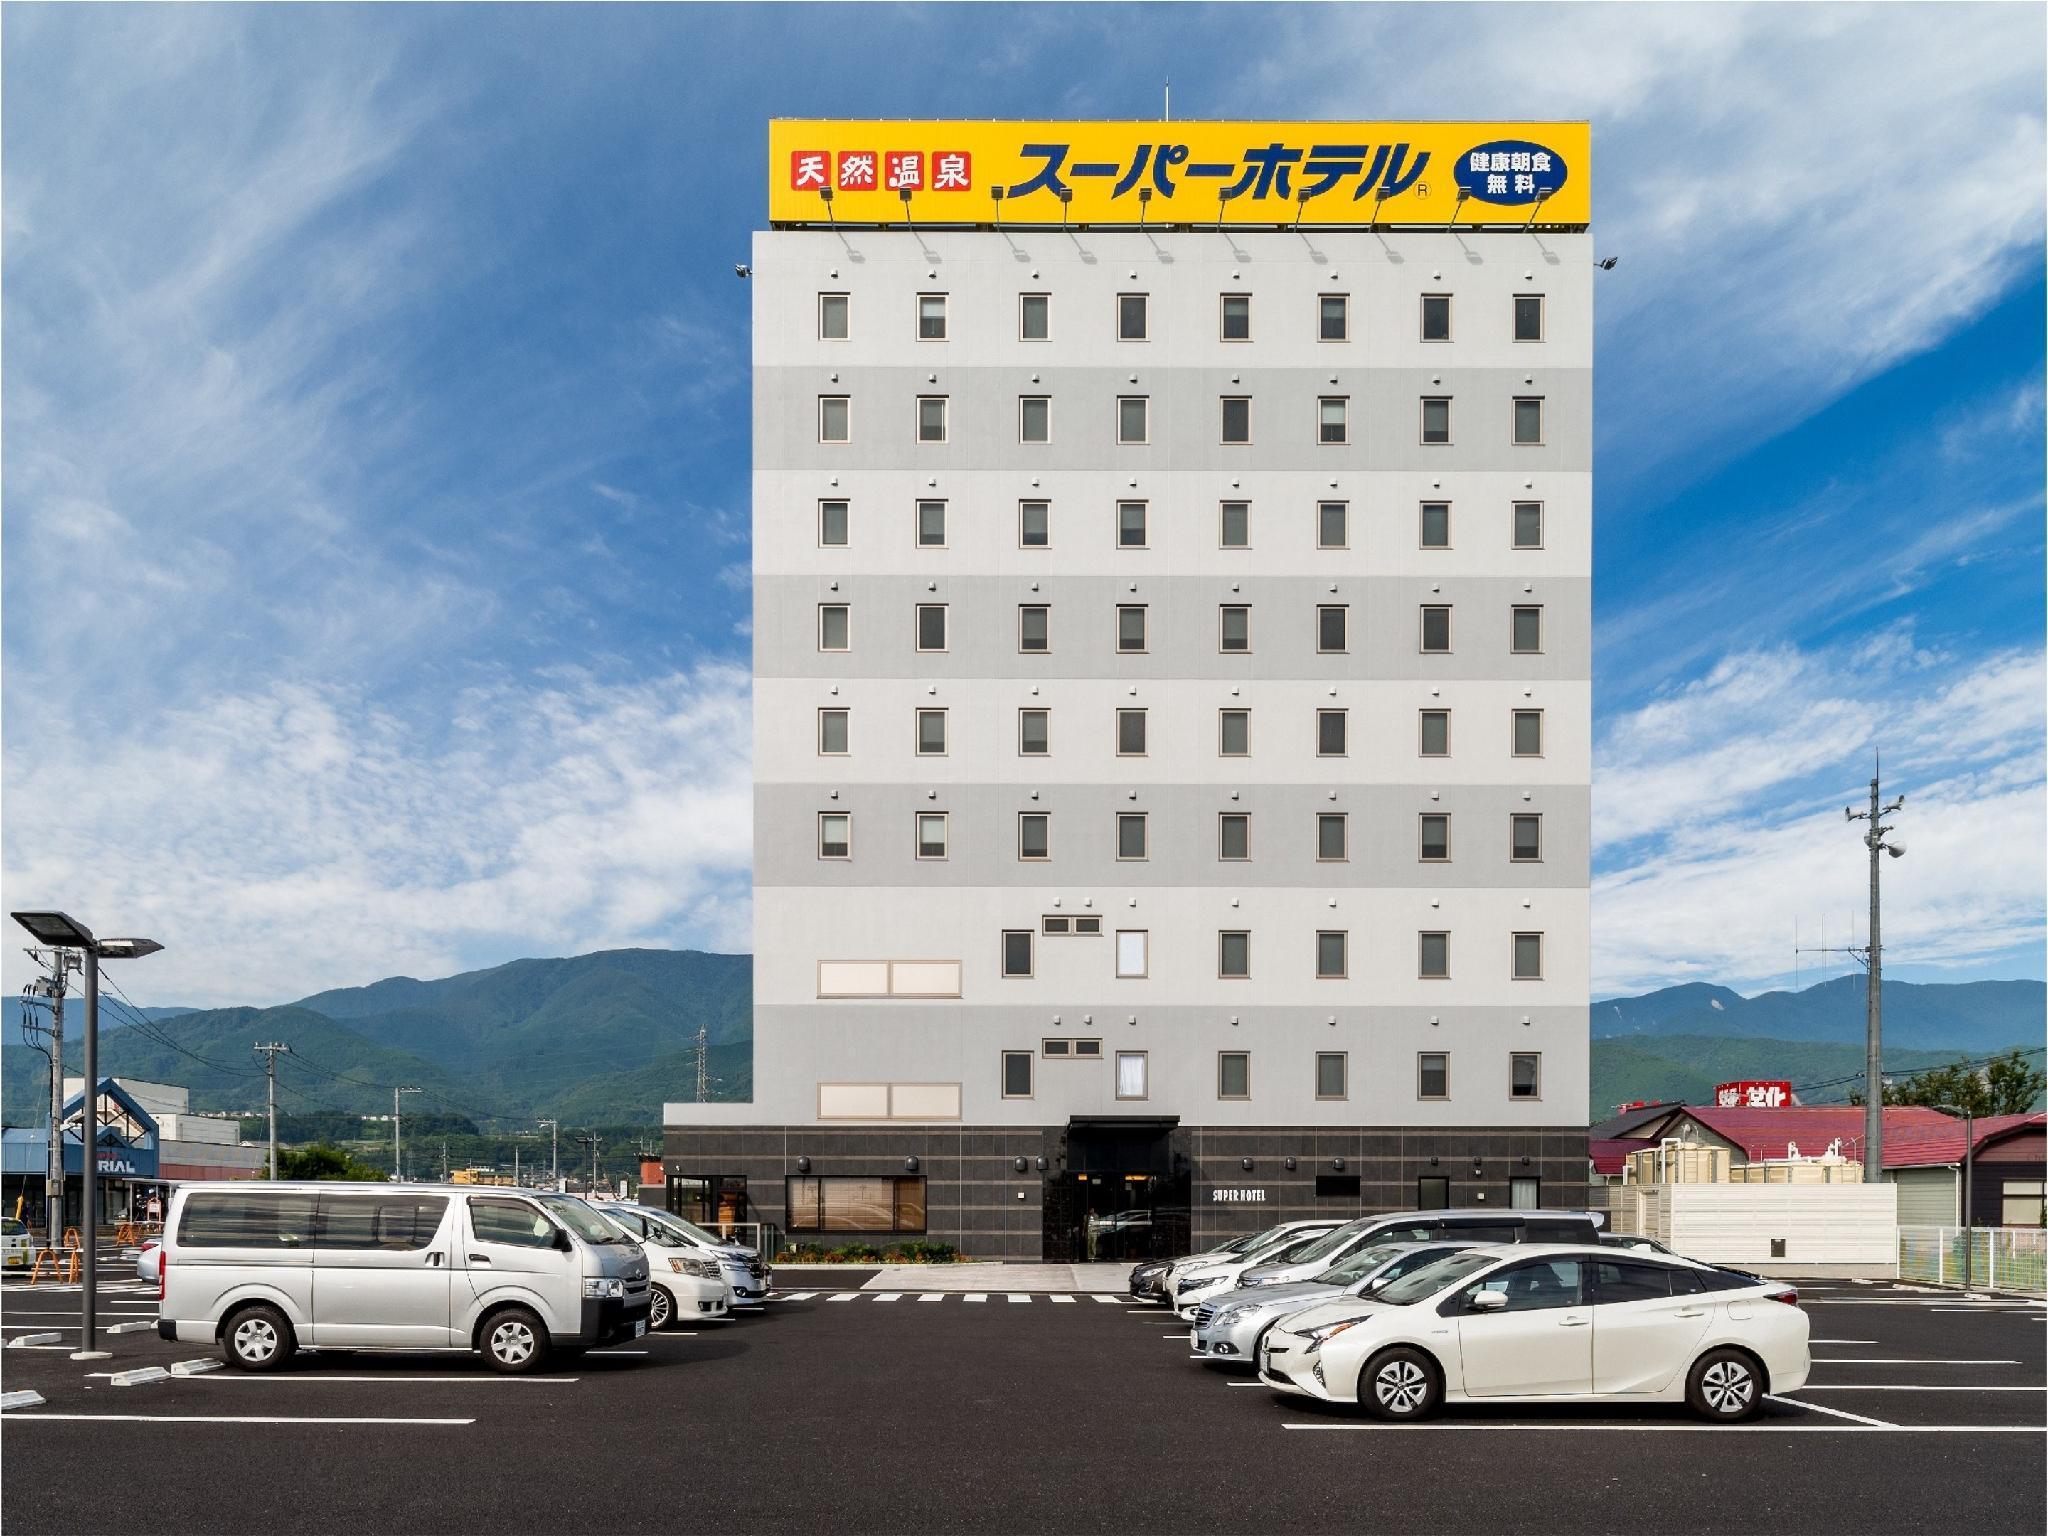 Super Hotel Yamanashi Minami Alps